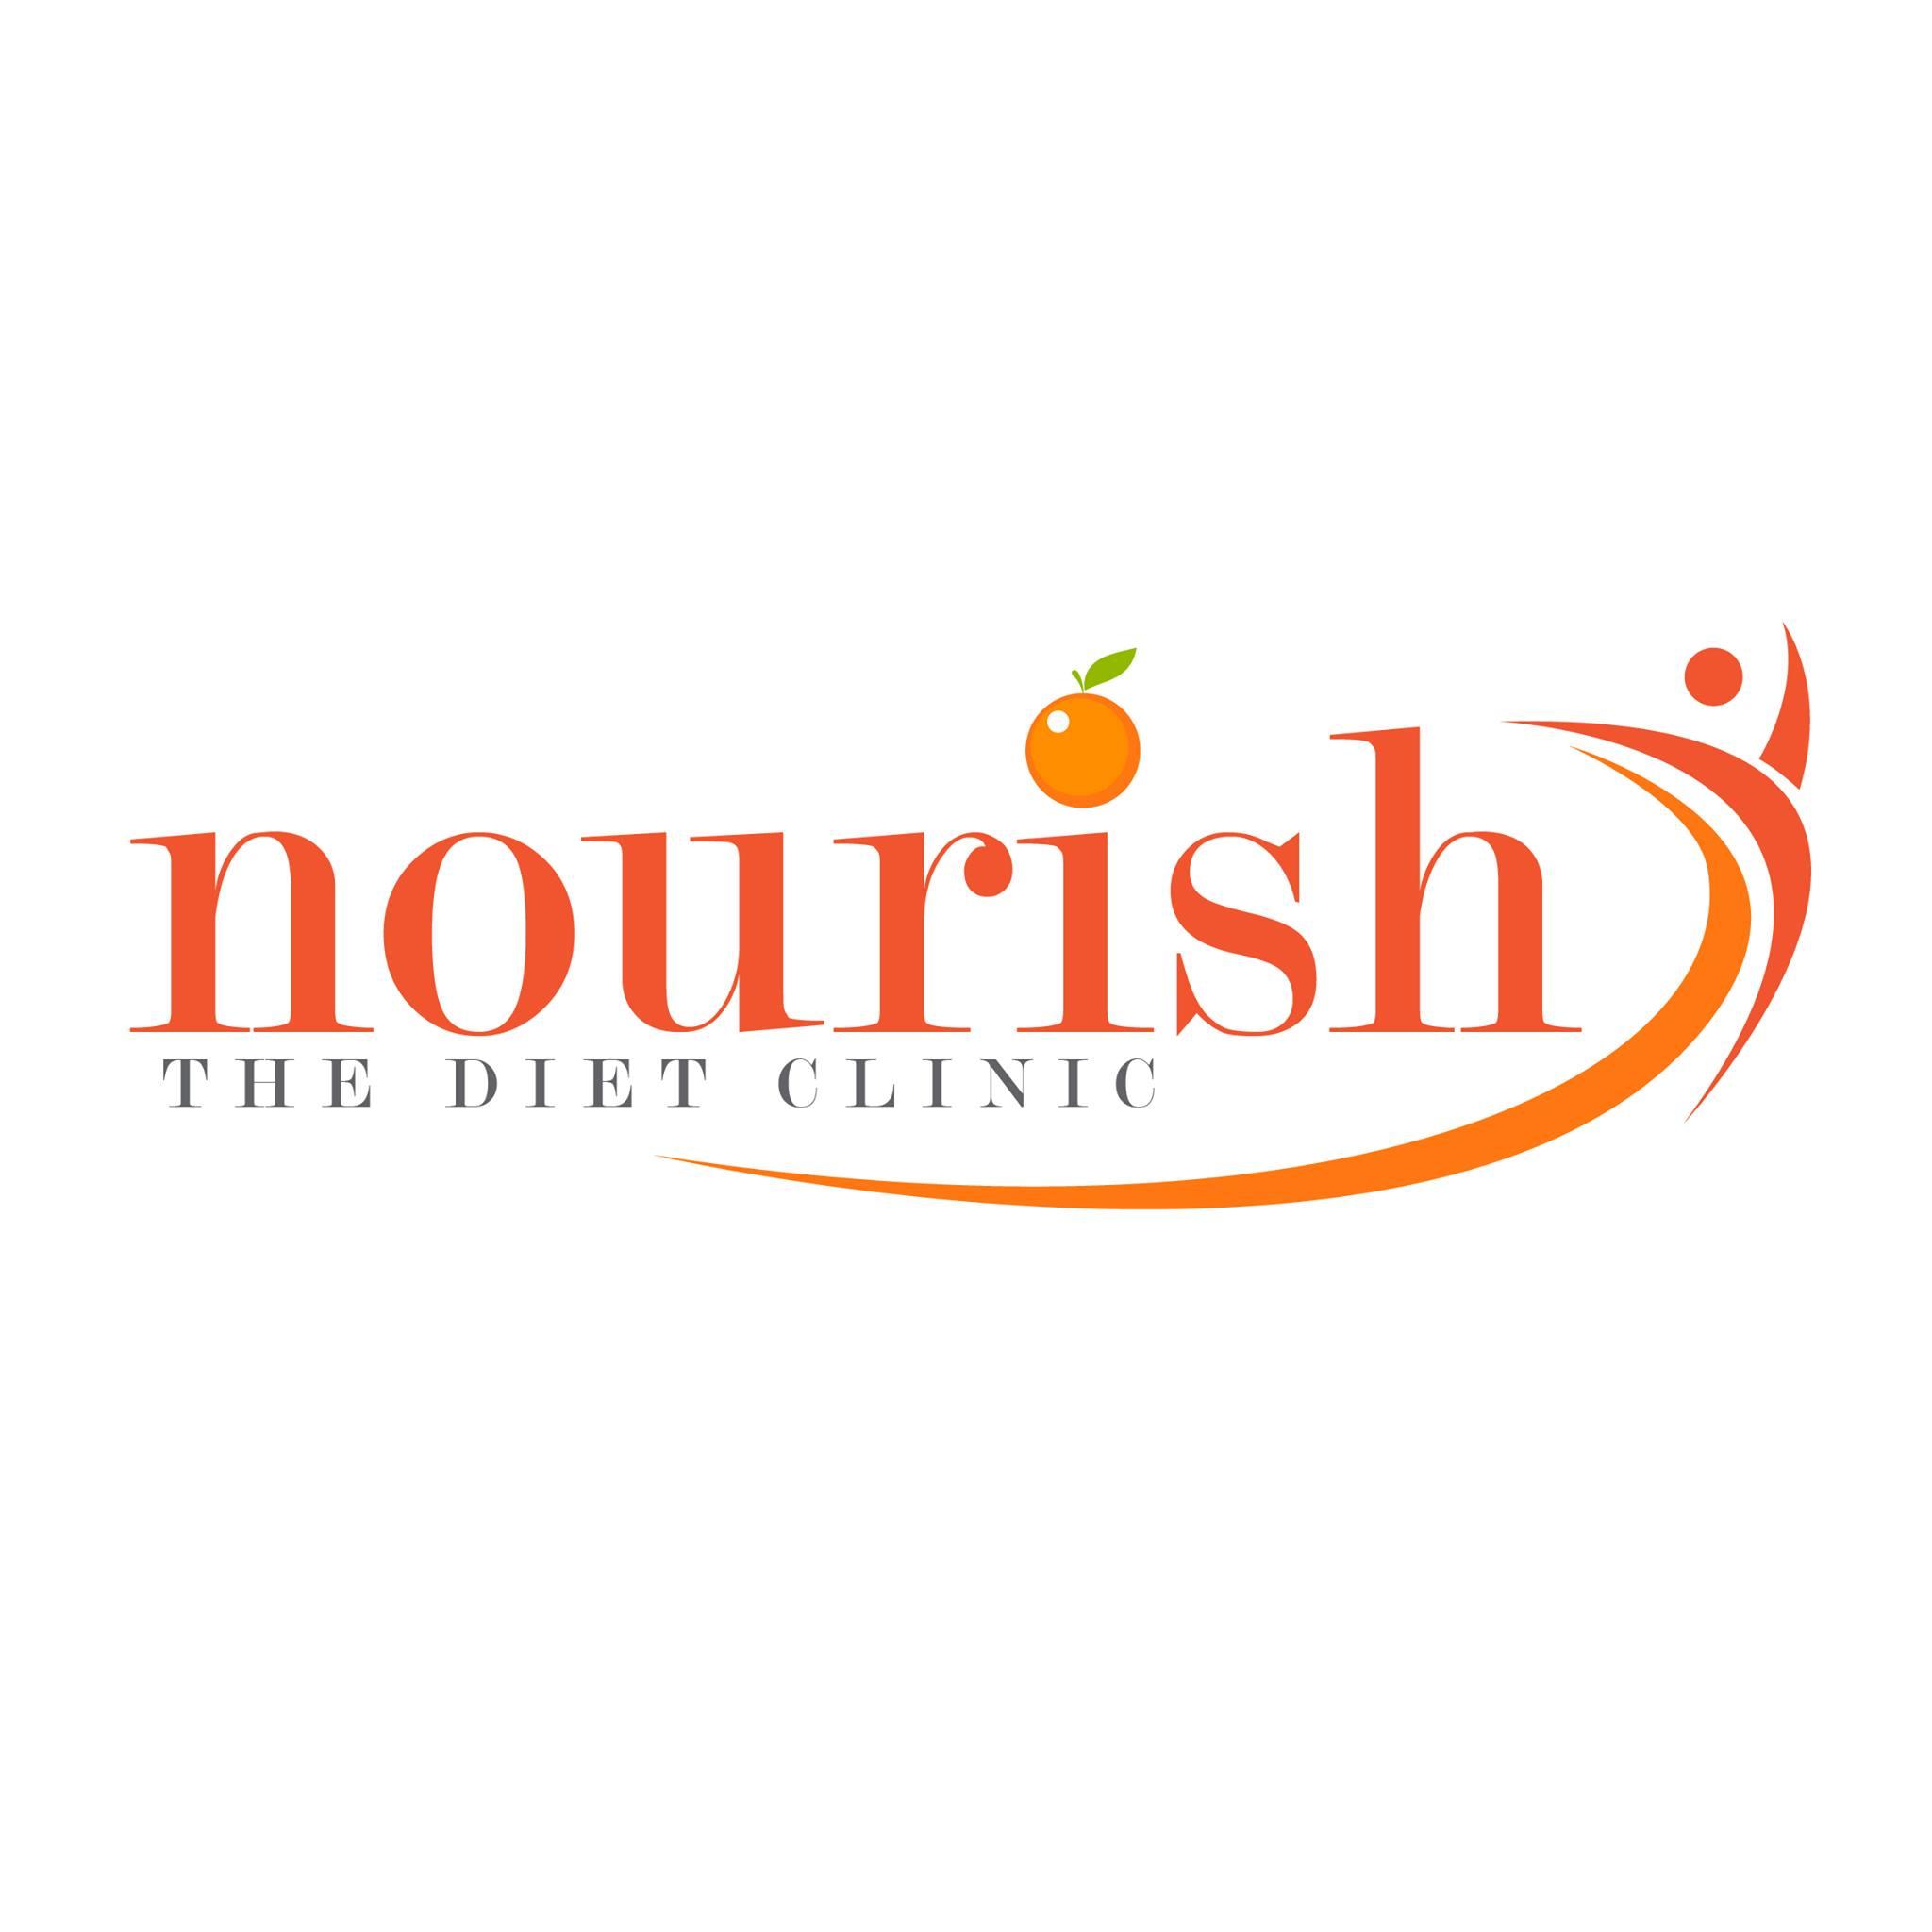 Nourish - The Diet Clinic